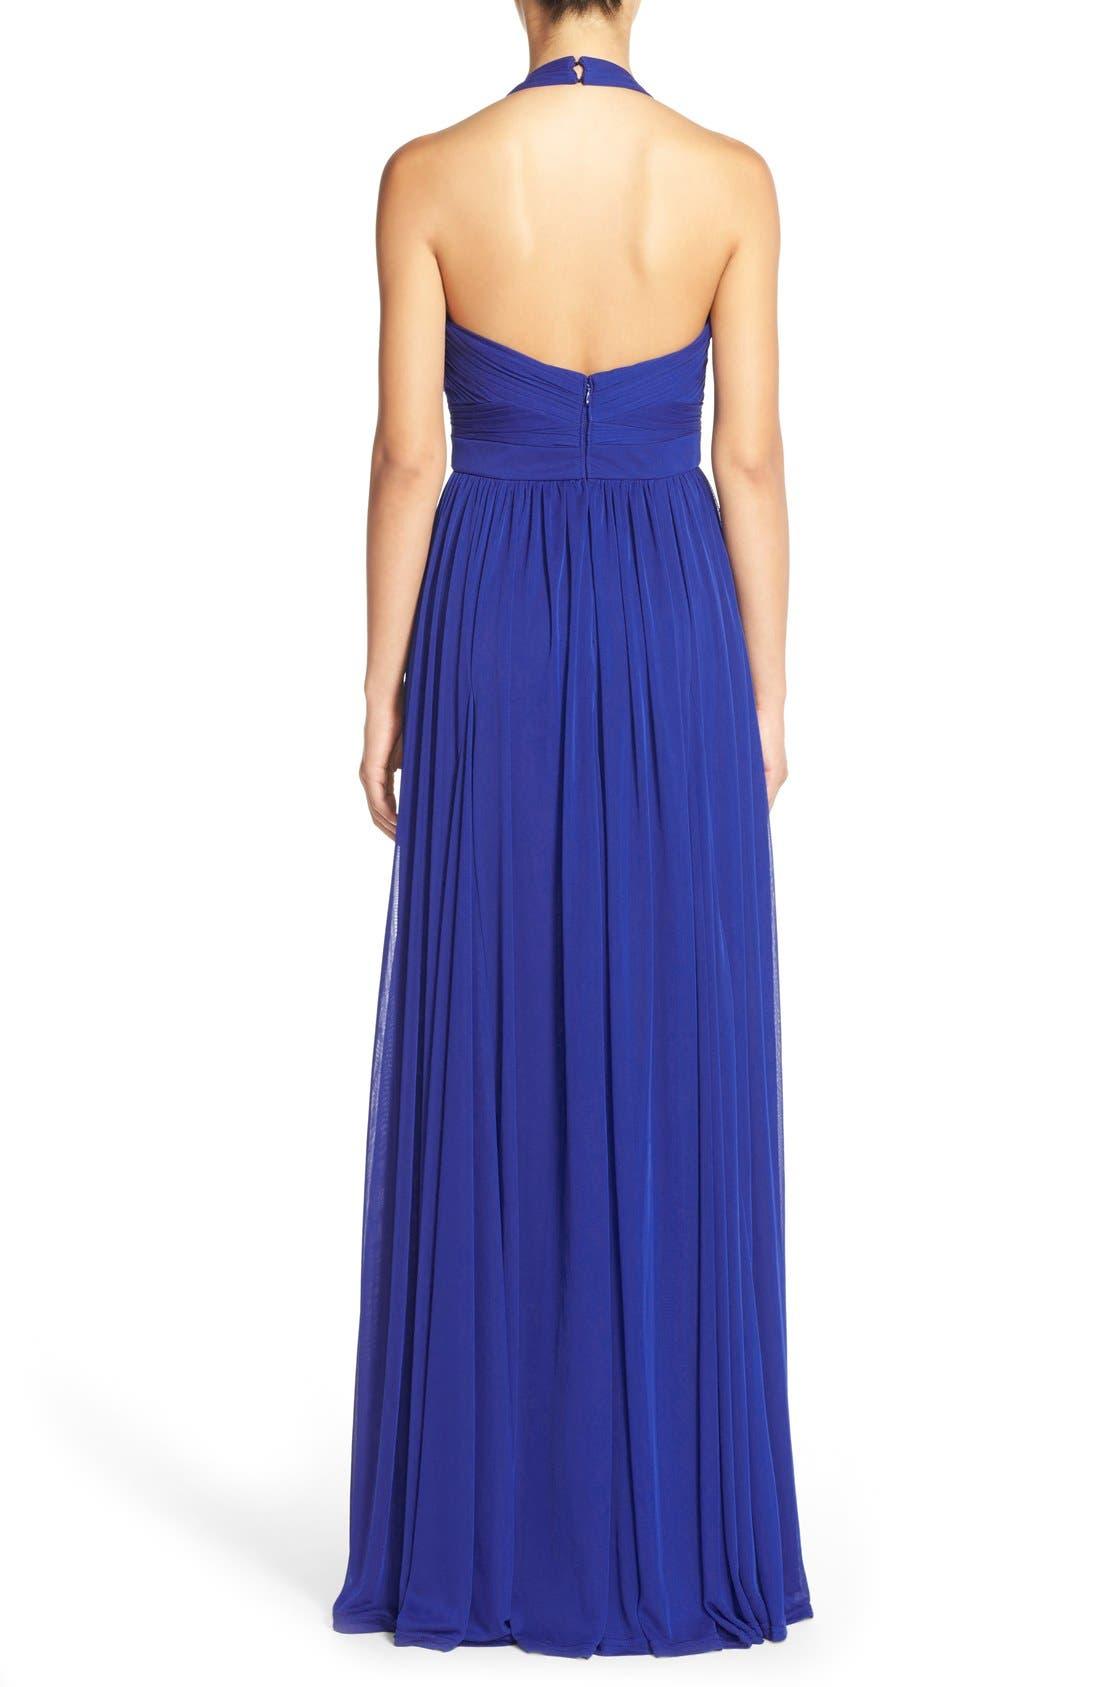 Embellished Tulle Halter Gown,                             Alternate thumbnail 2, color,                             437